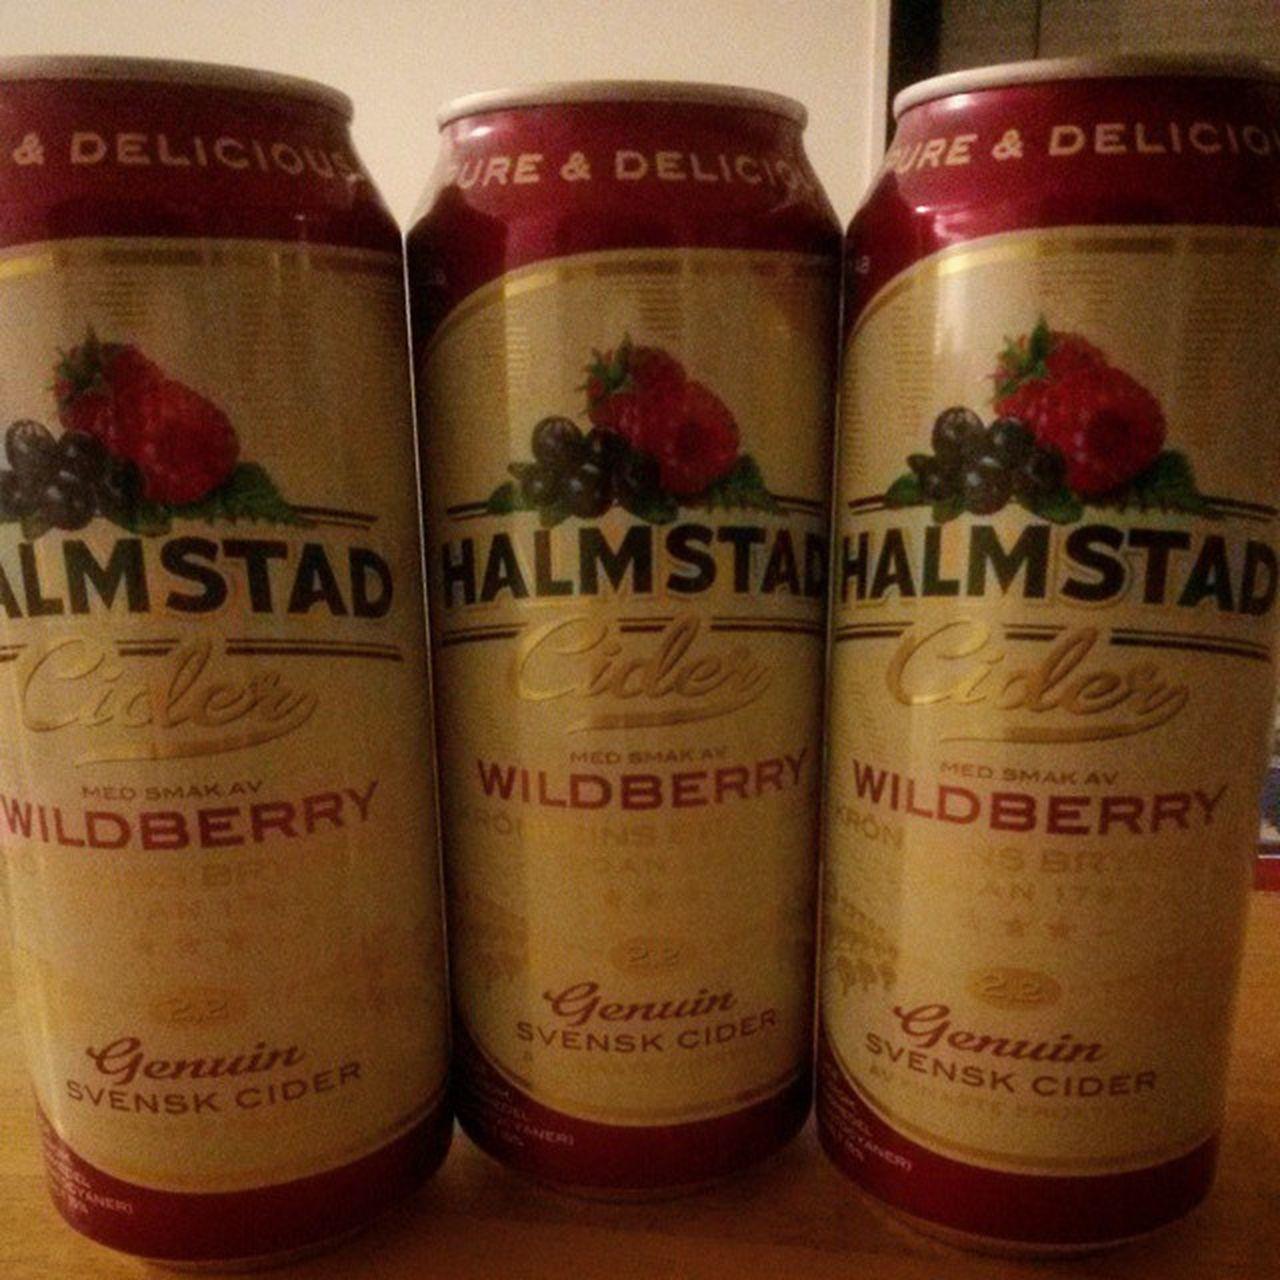 Cider Halmstad Wildberry Svensk